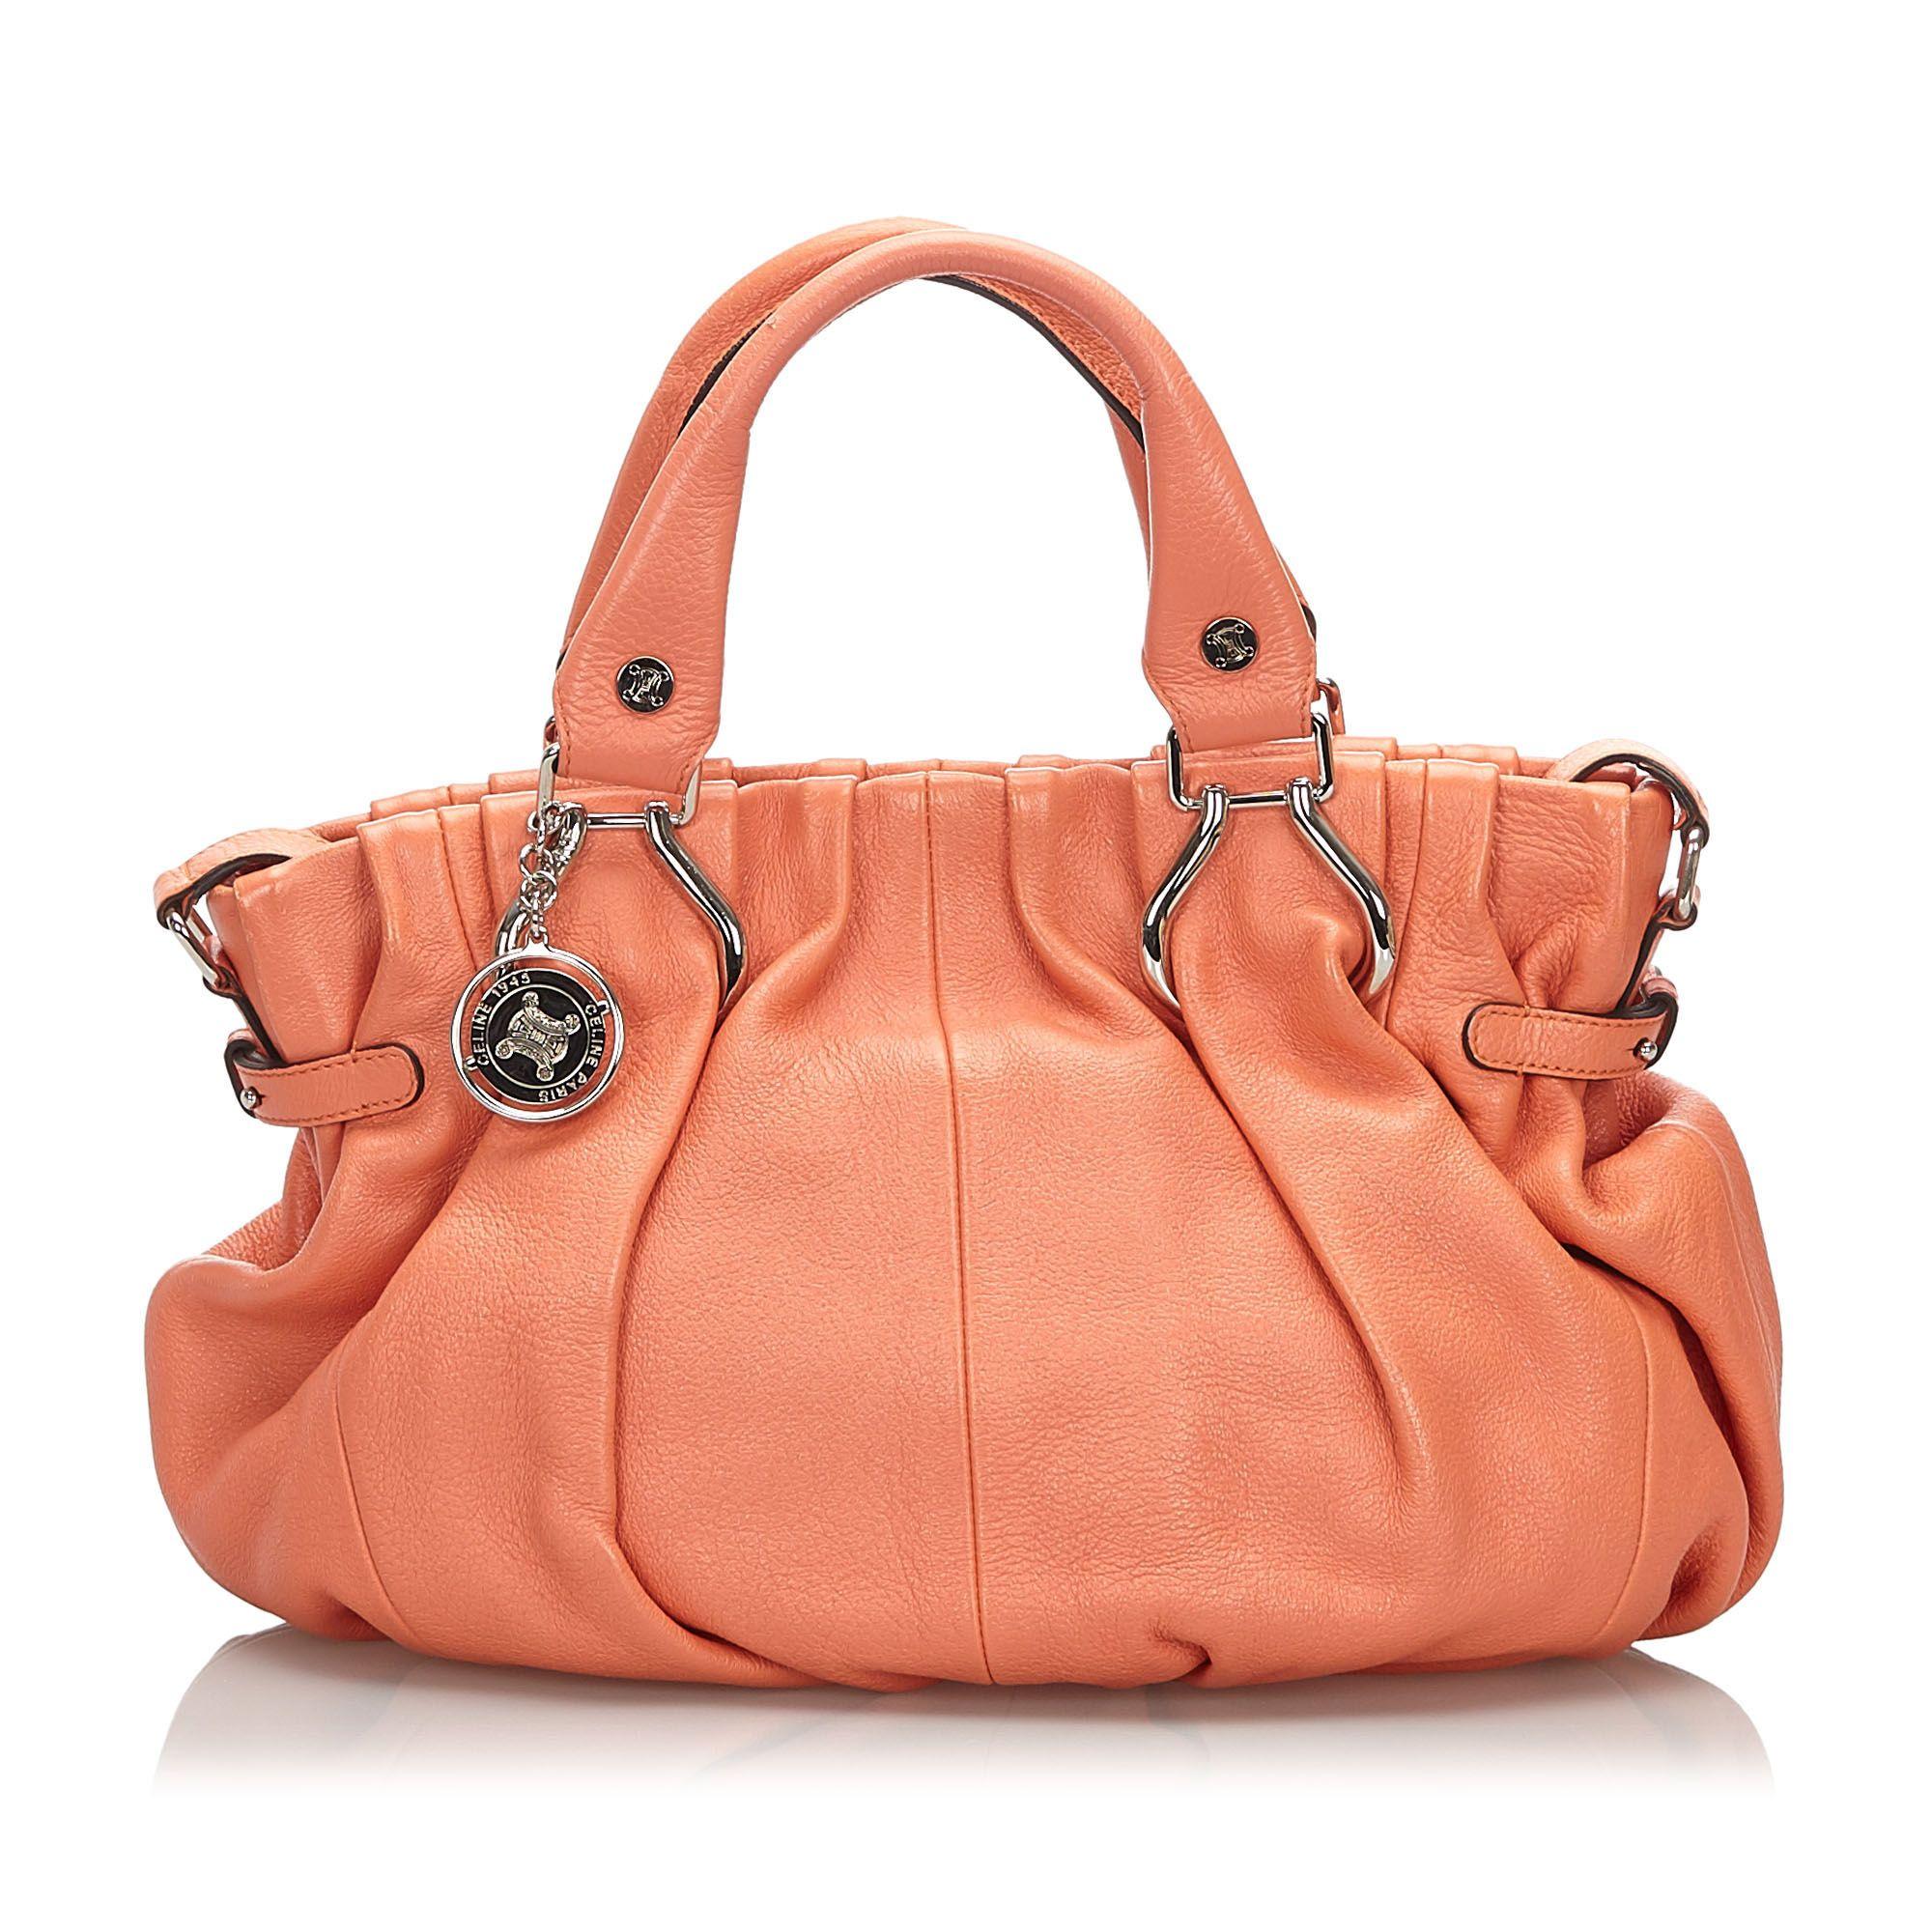 Vintage Celine Leather Satchel Orange